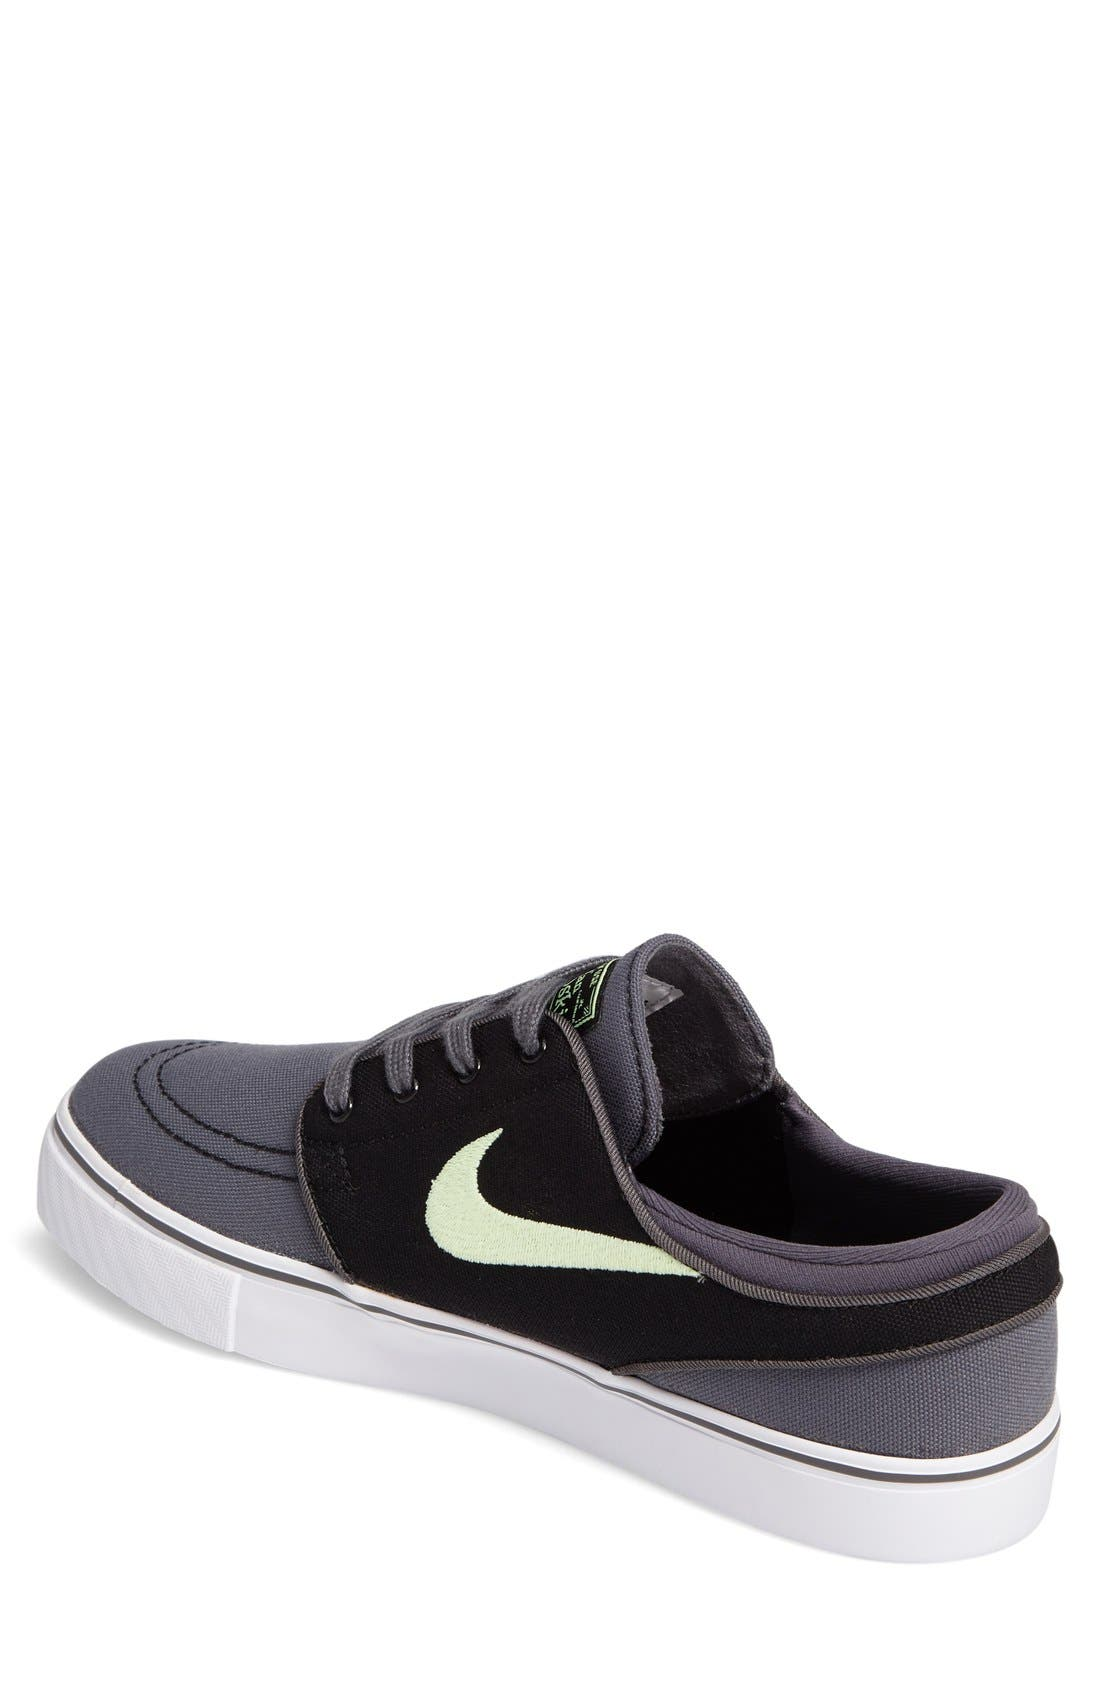 Zoom - Stefan Janoski SB Canvas Skate Shoe,                             Alternate thumbnail 196, color,